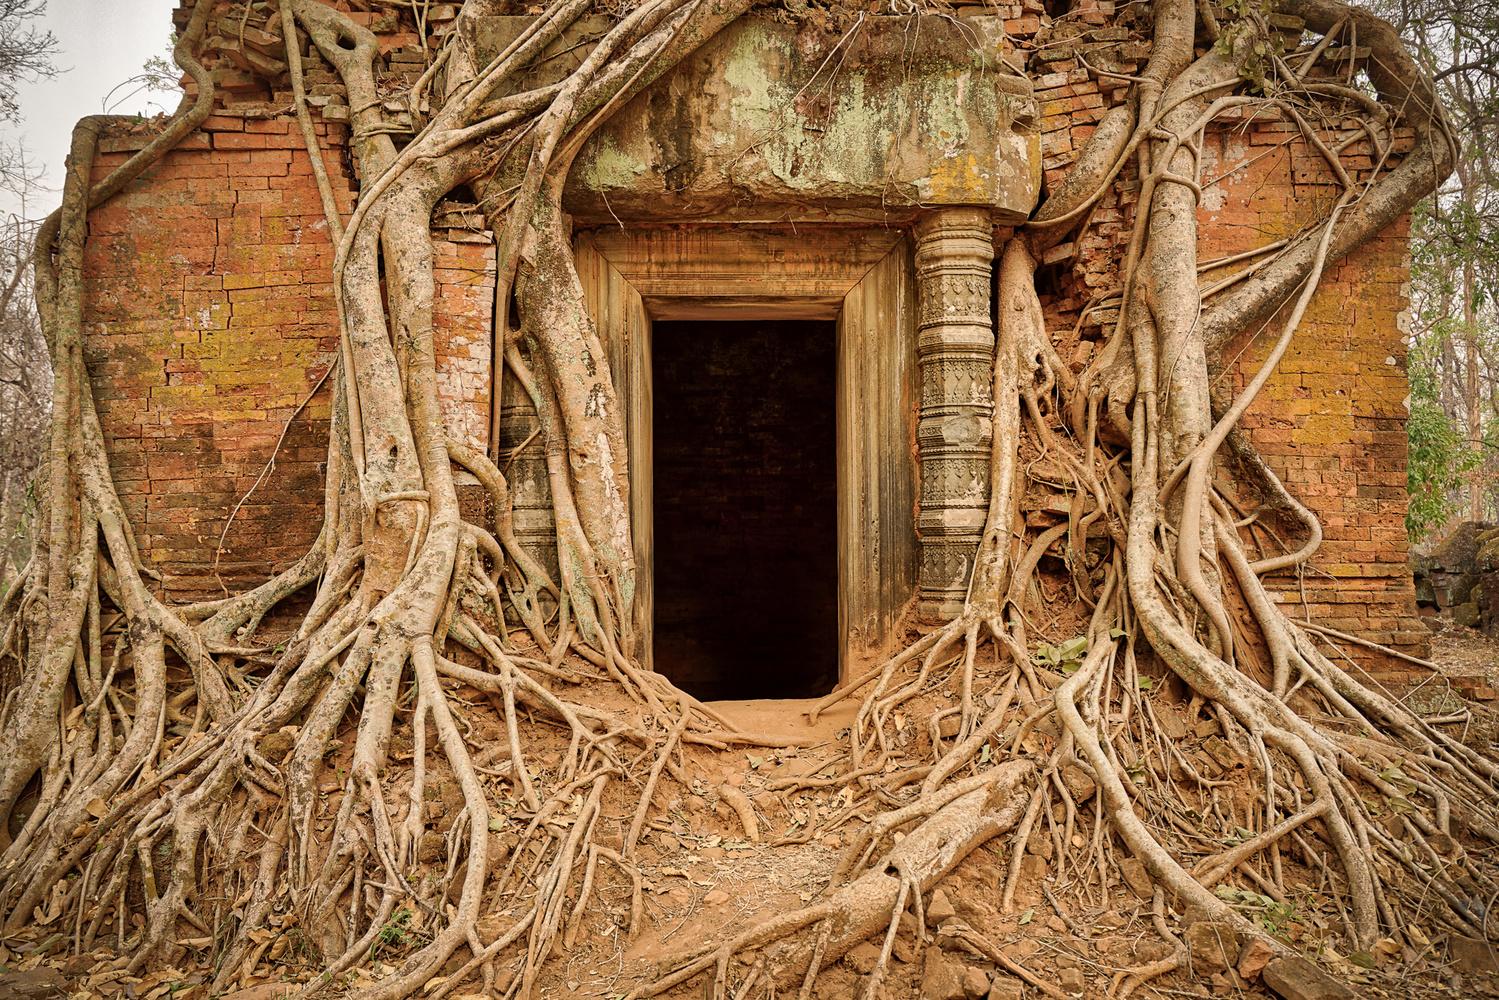 Prasat Pram Entrance by Gabe Taviano